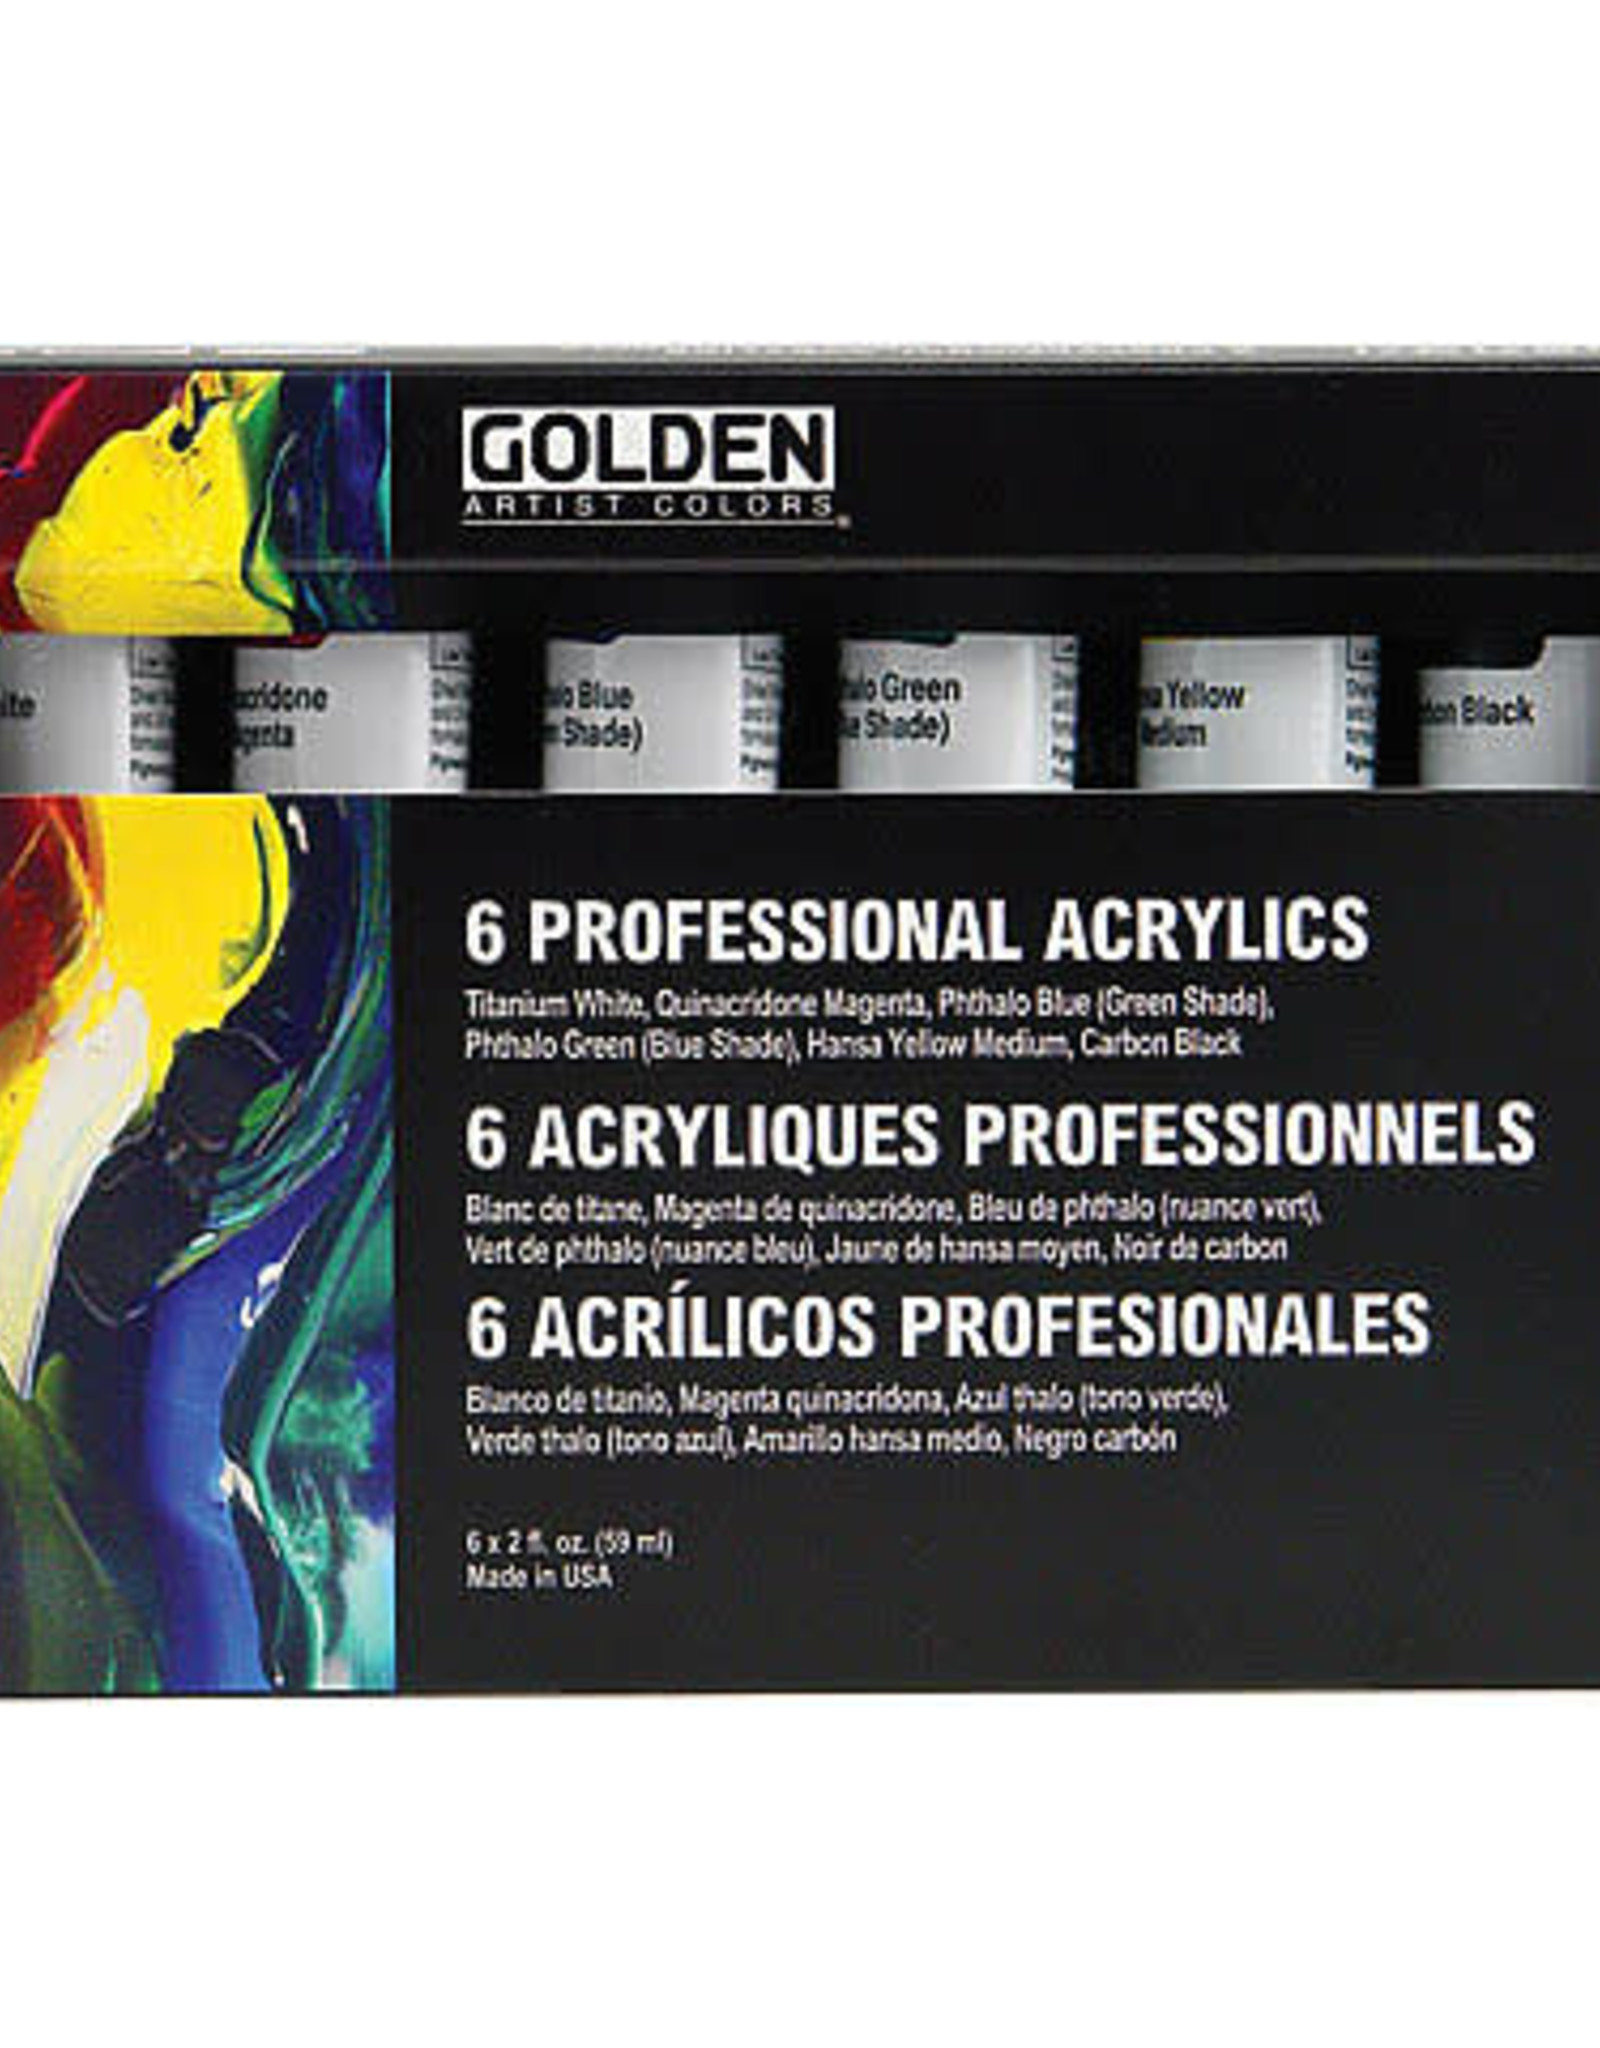 Golden Principal Professional Heavy-Body Acrylic Set